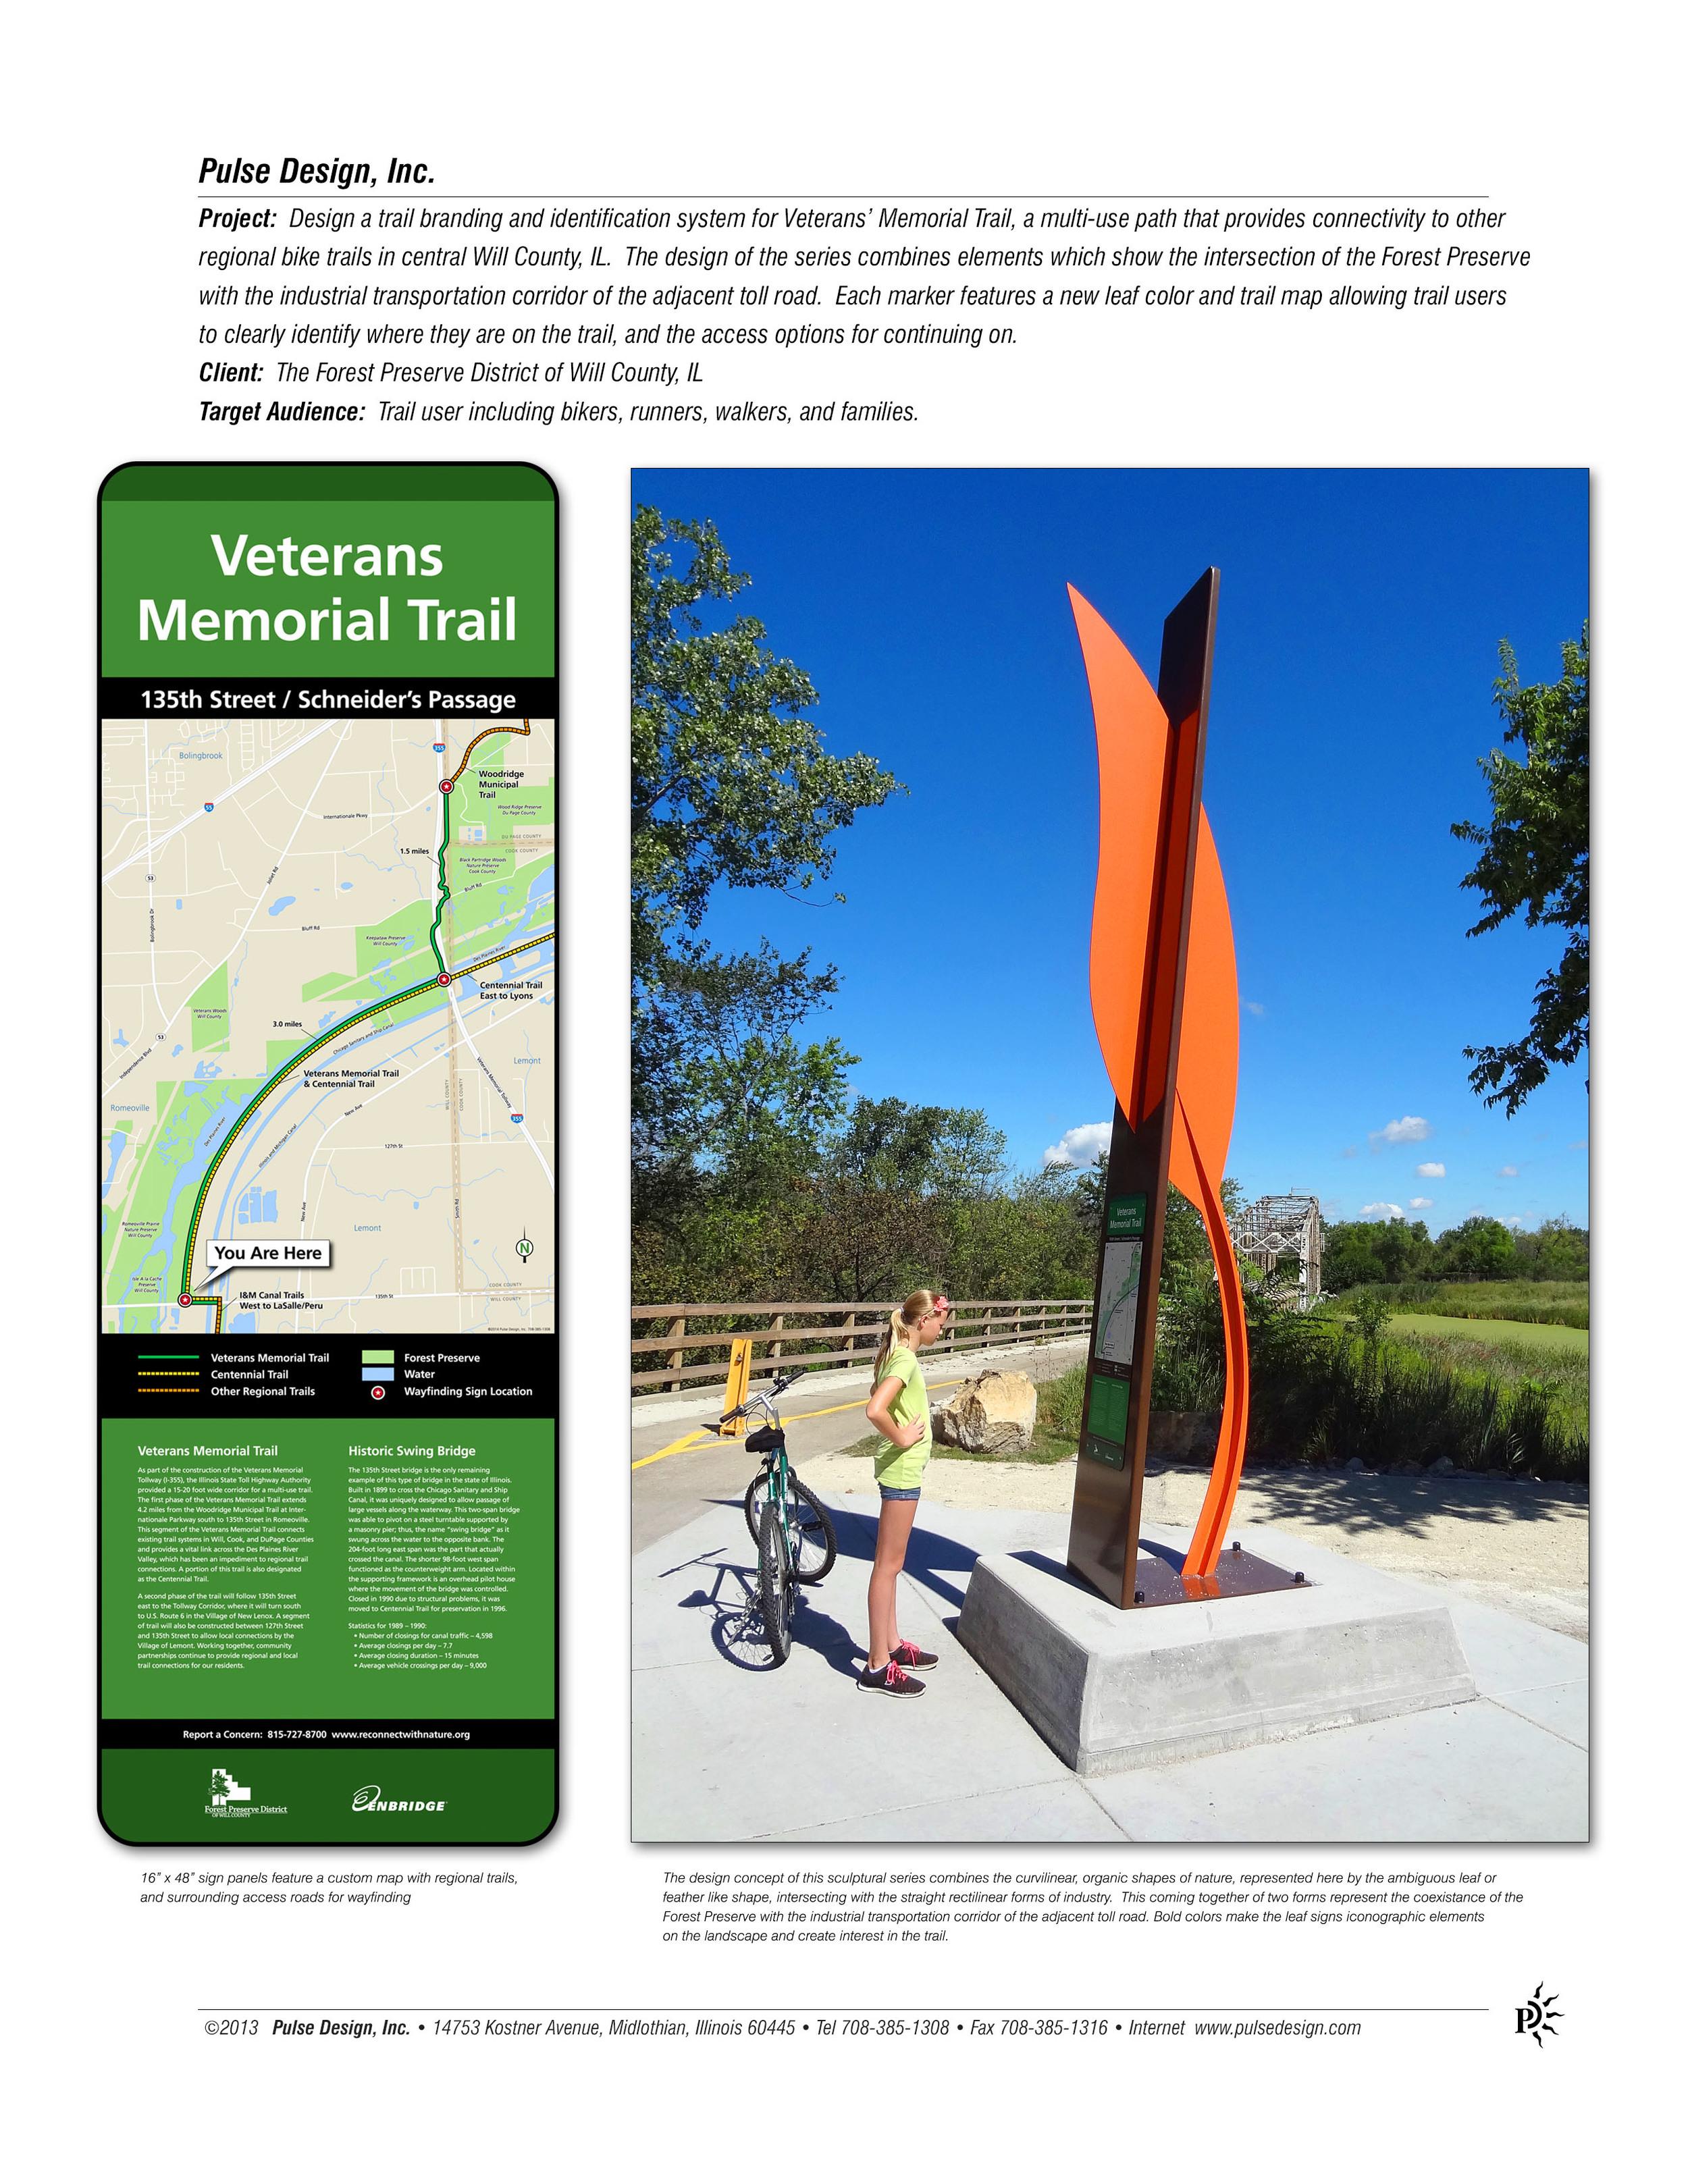 Veterans-Memorial-Trail-Sign-Photo-Orange-Pulse-Design-Inc.jpg